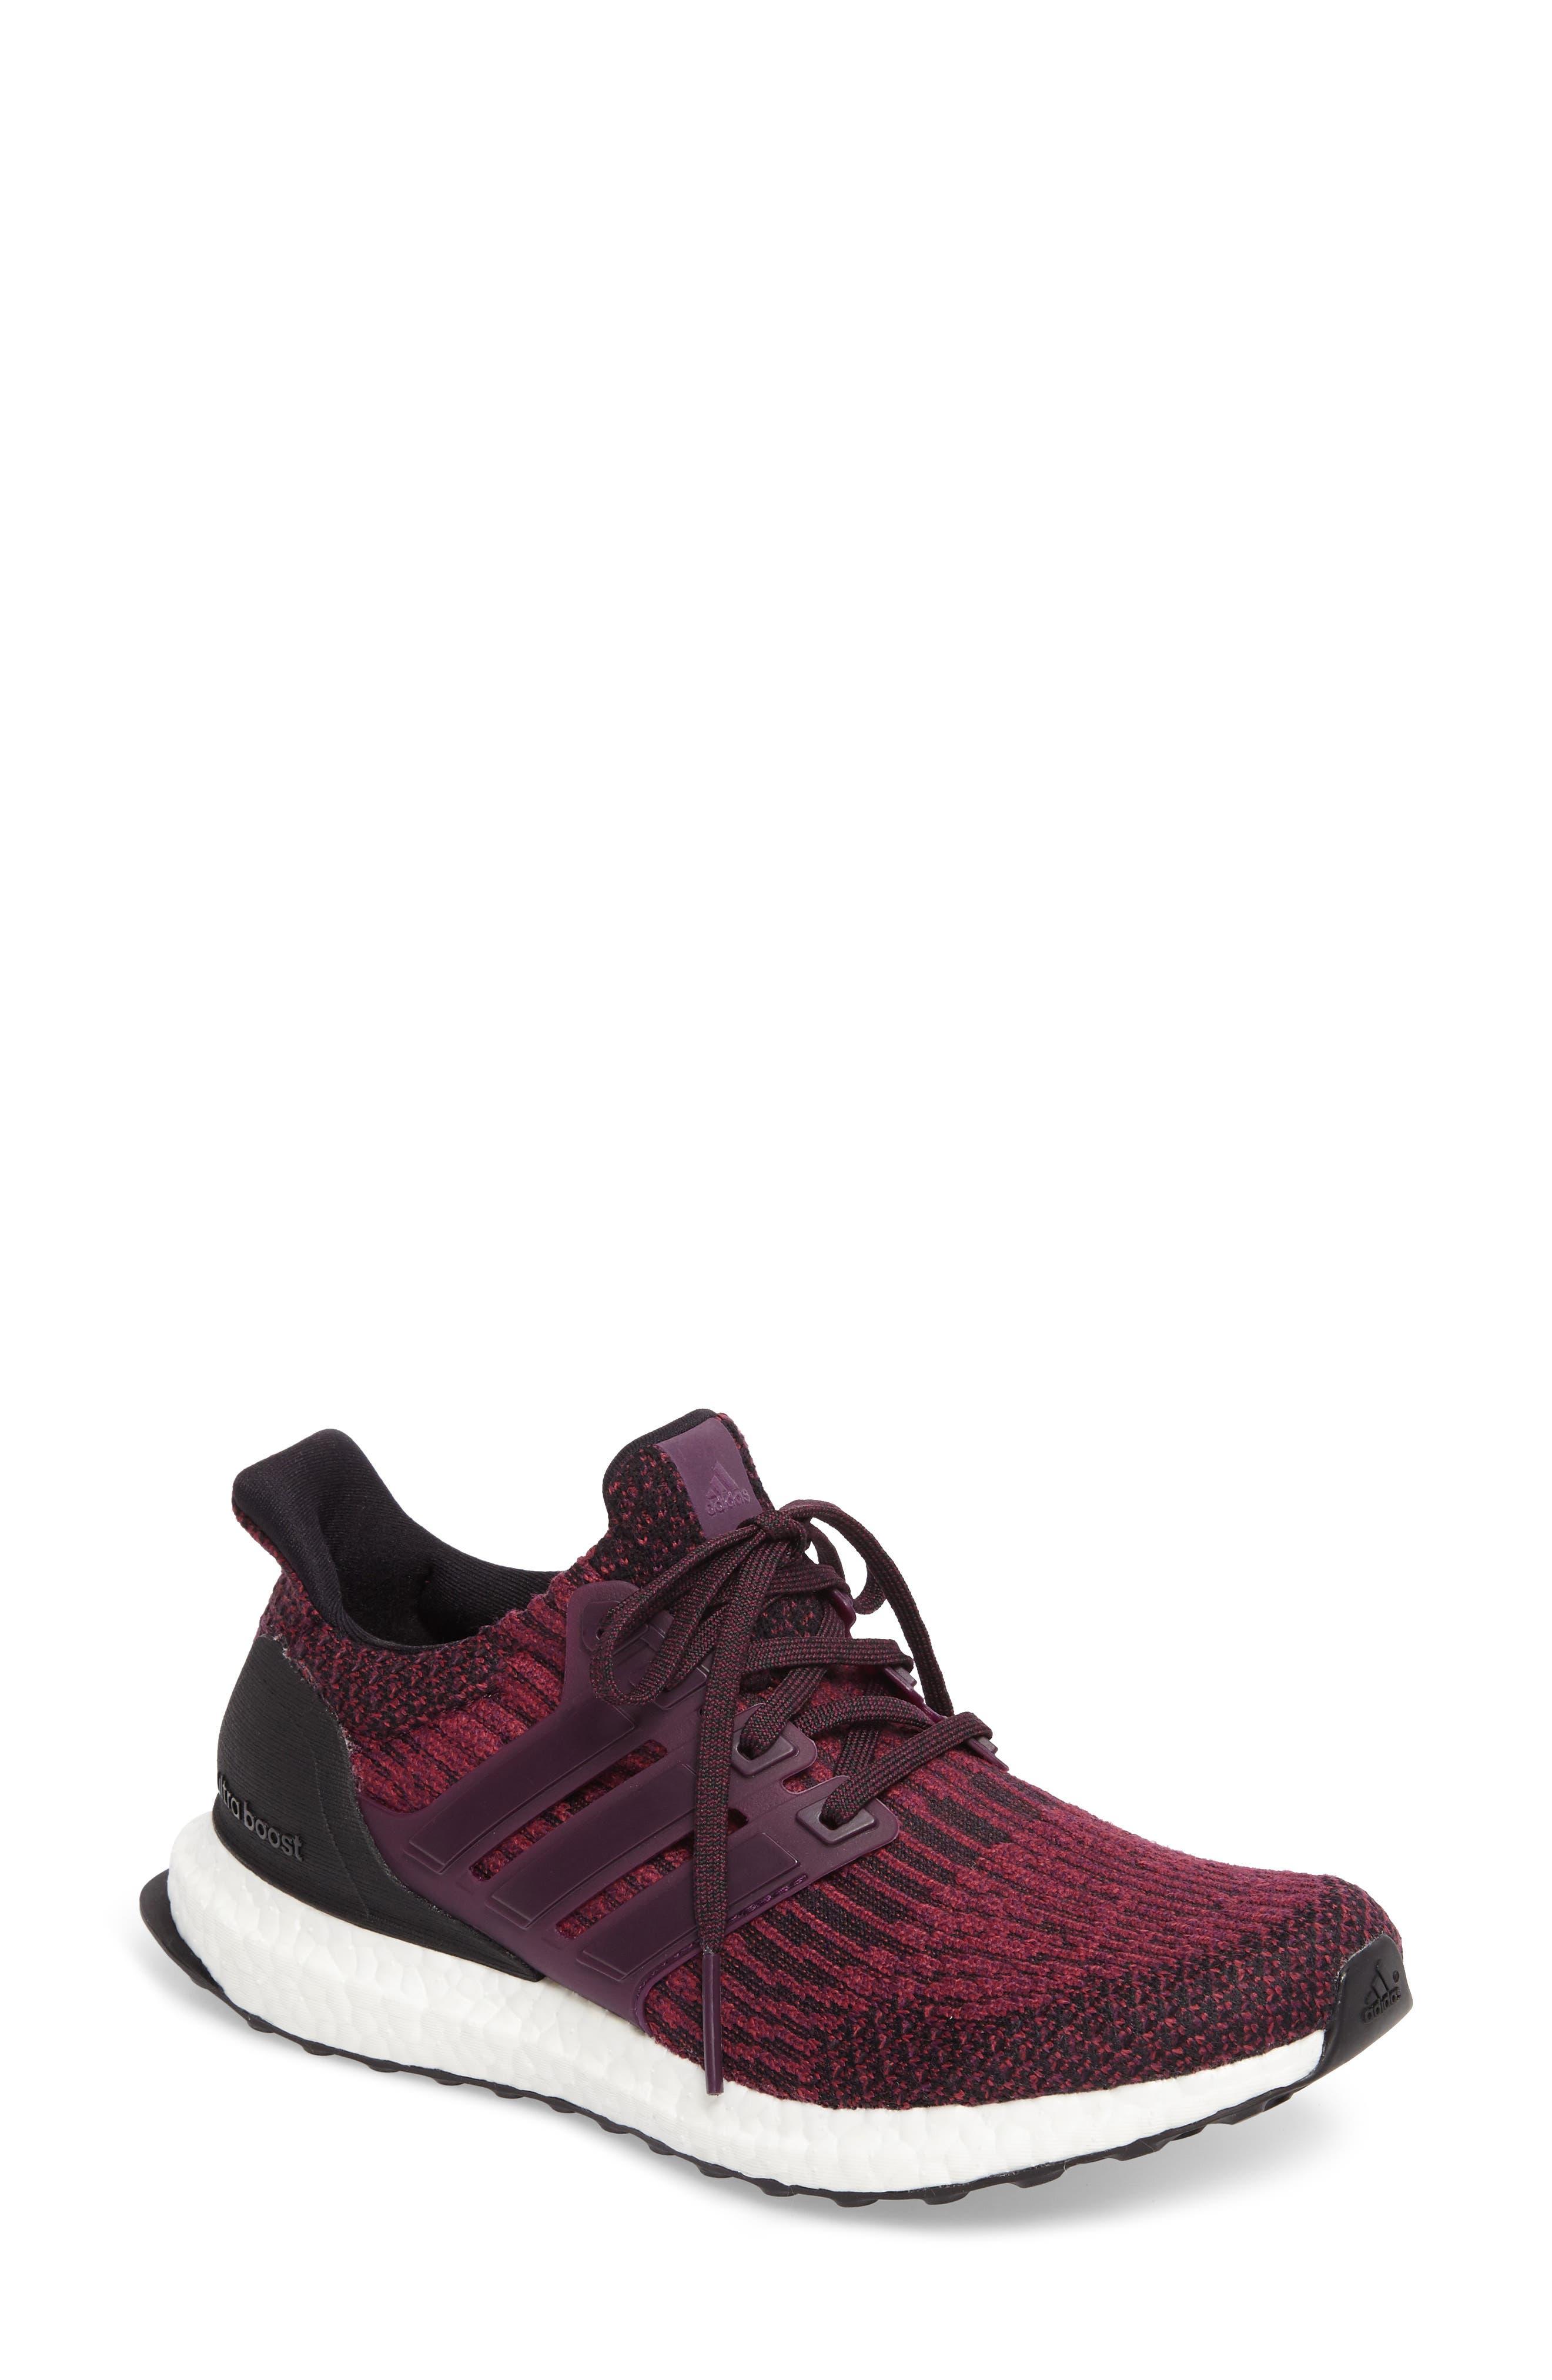 adidas ultra boost. main image - adidas \u0027ultraboost\u0027 running shoe ultra boost h